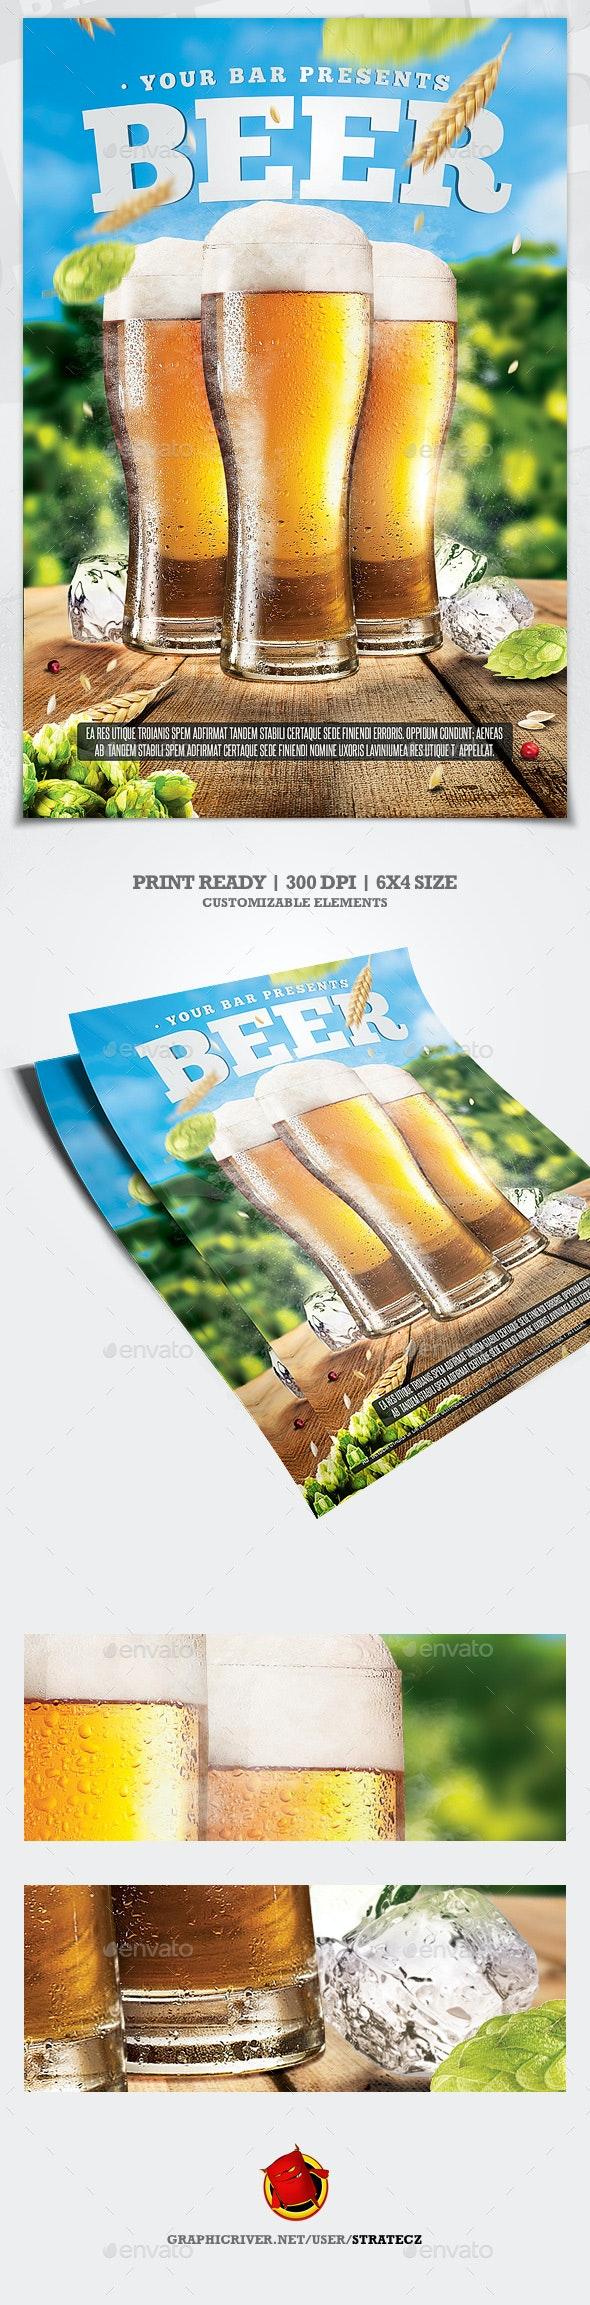 Beer Day Flyer - Commerce Flyers